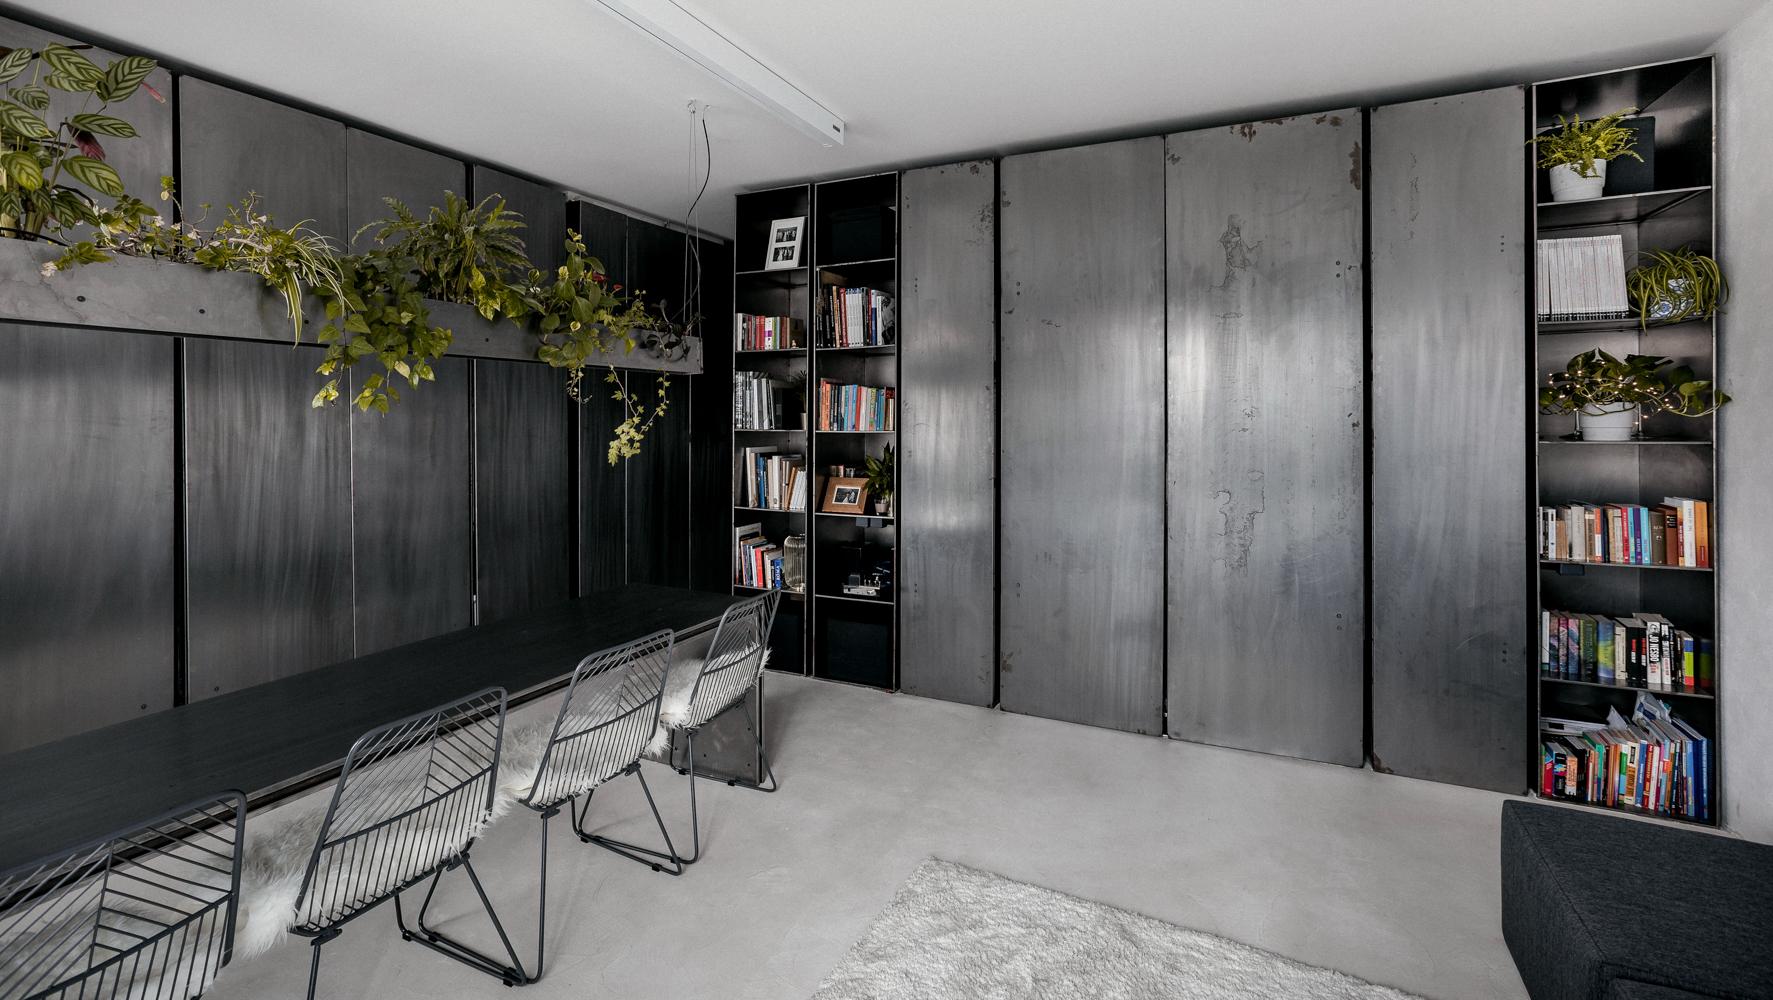 zero-room-apartment-mas-the-design-emotive-13.jpg